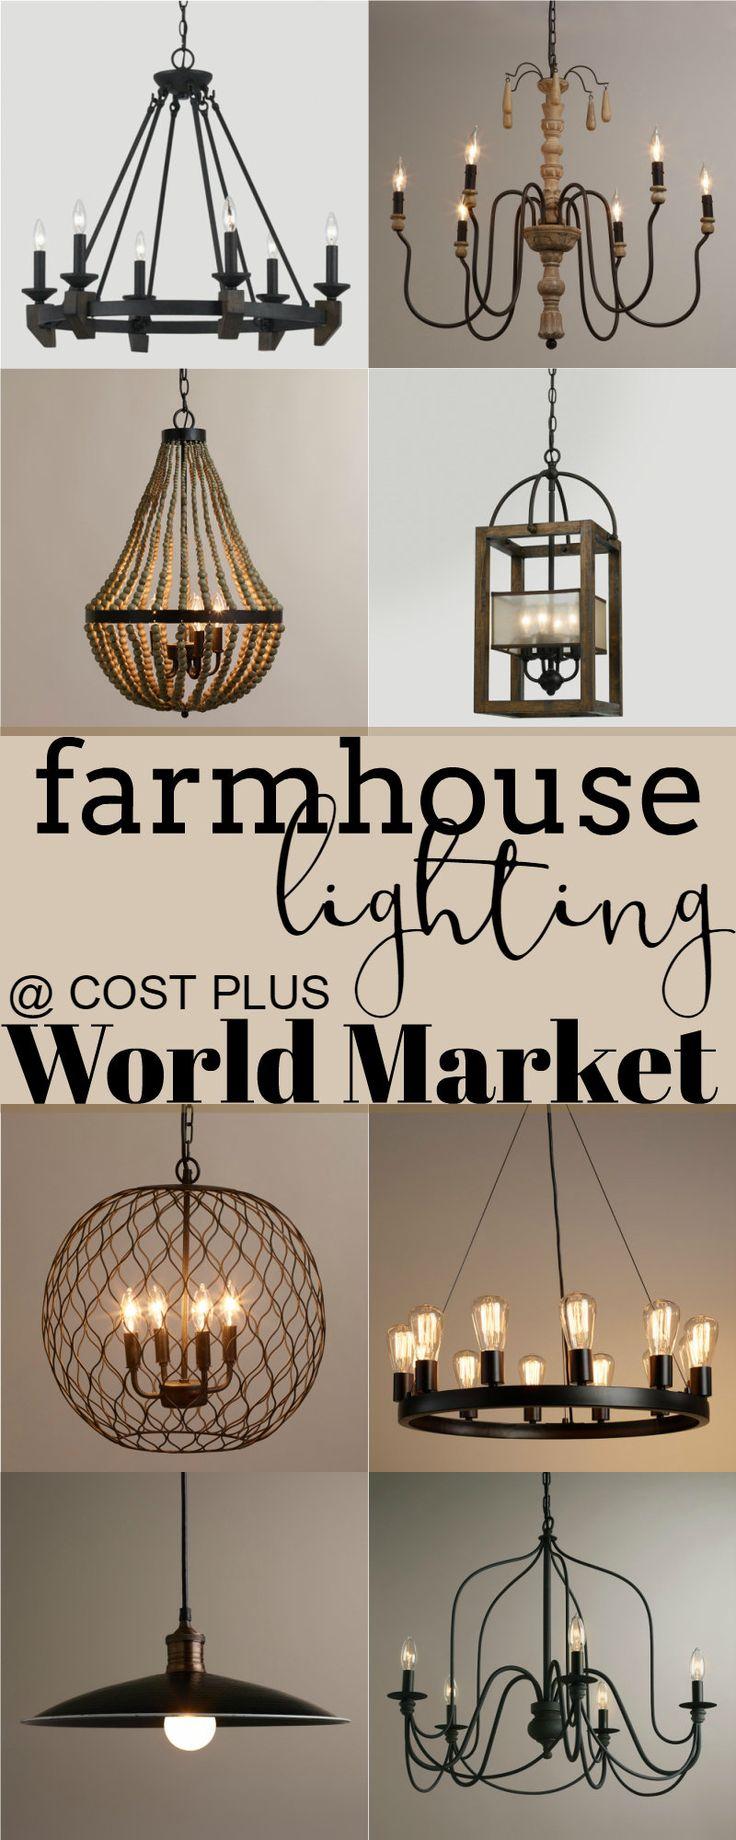 best 25+ farmhouse restaurant ideas on pinterest | industrial